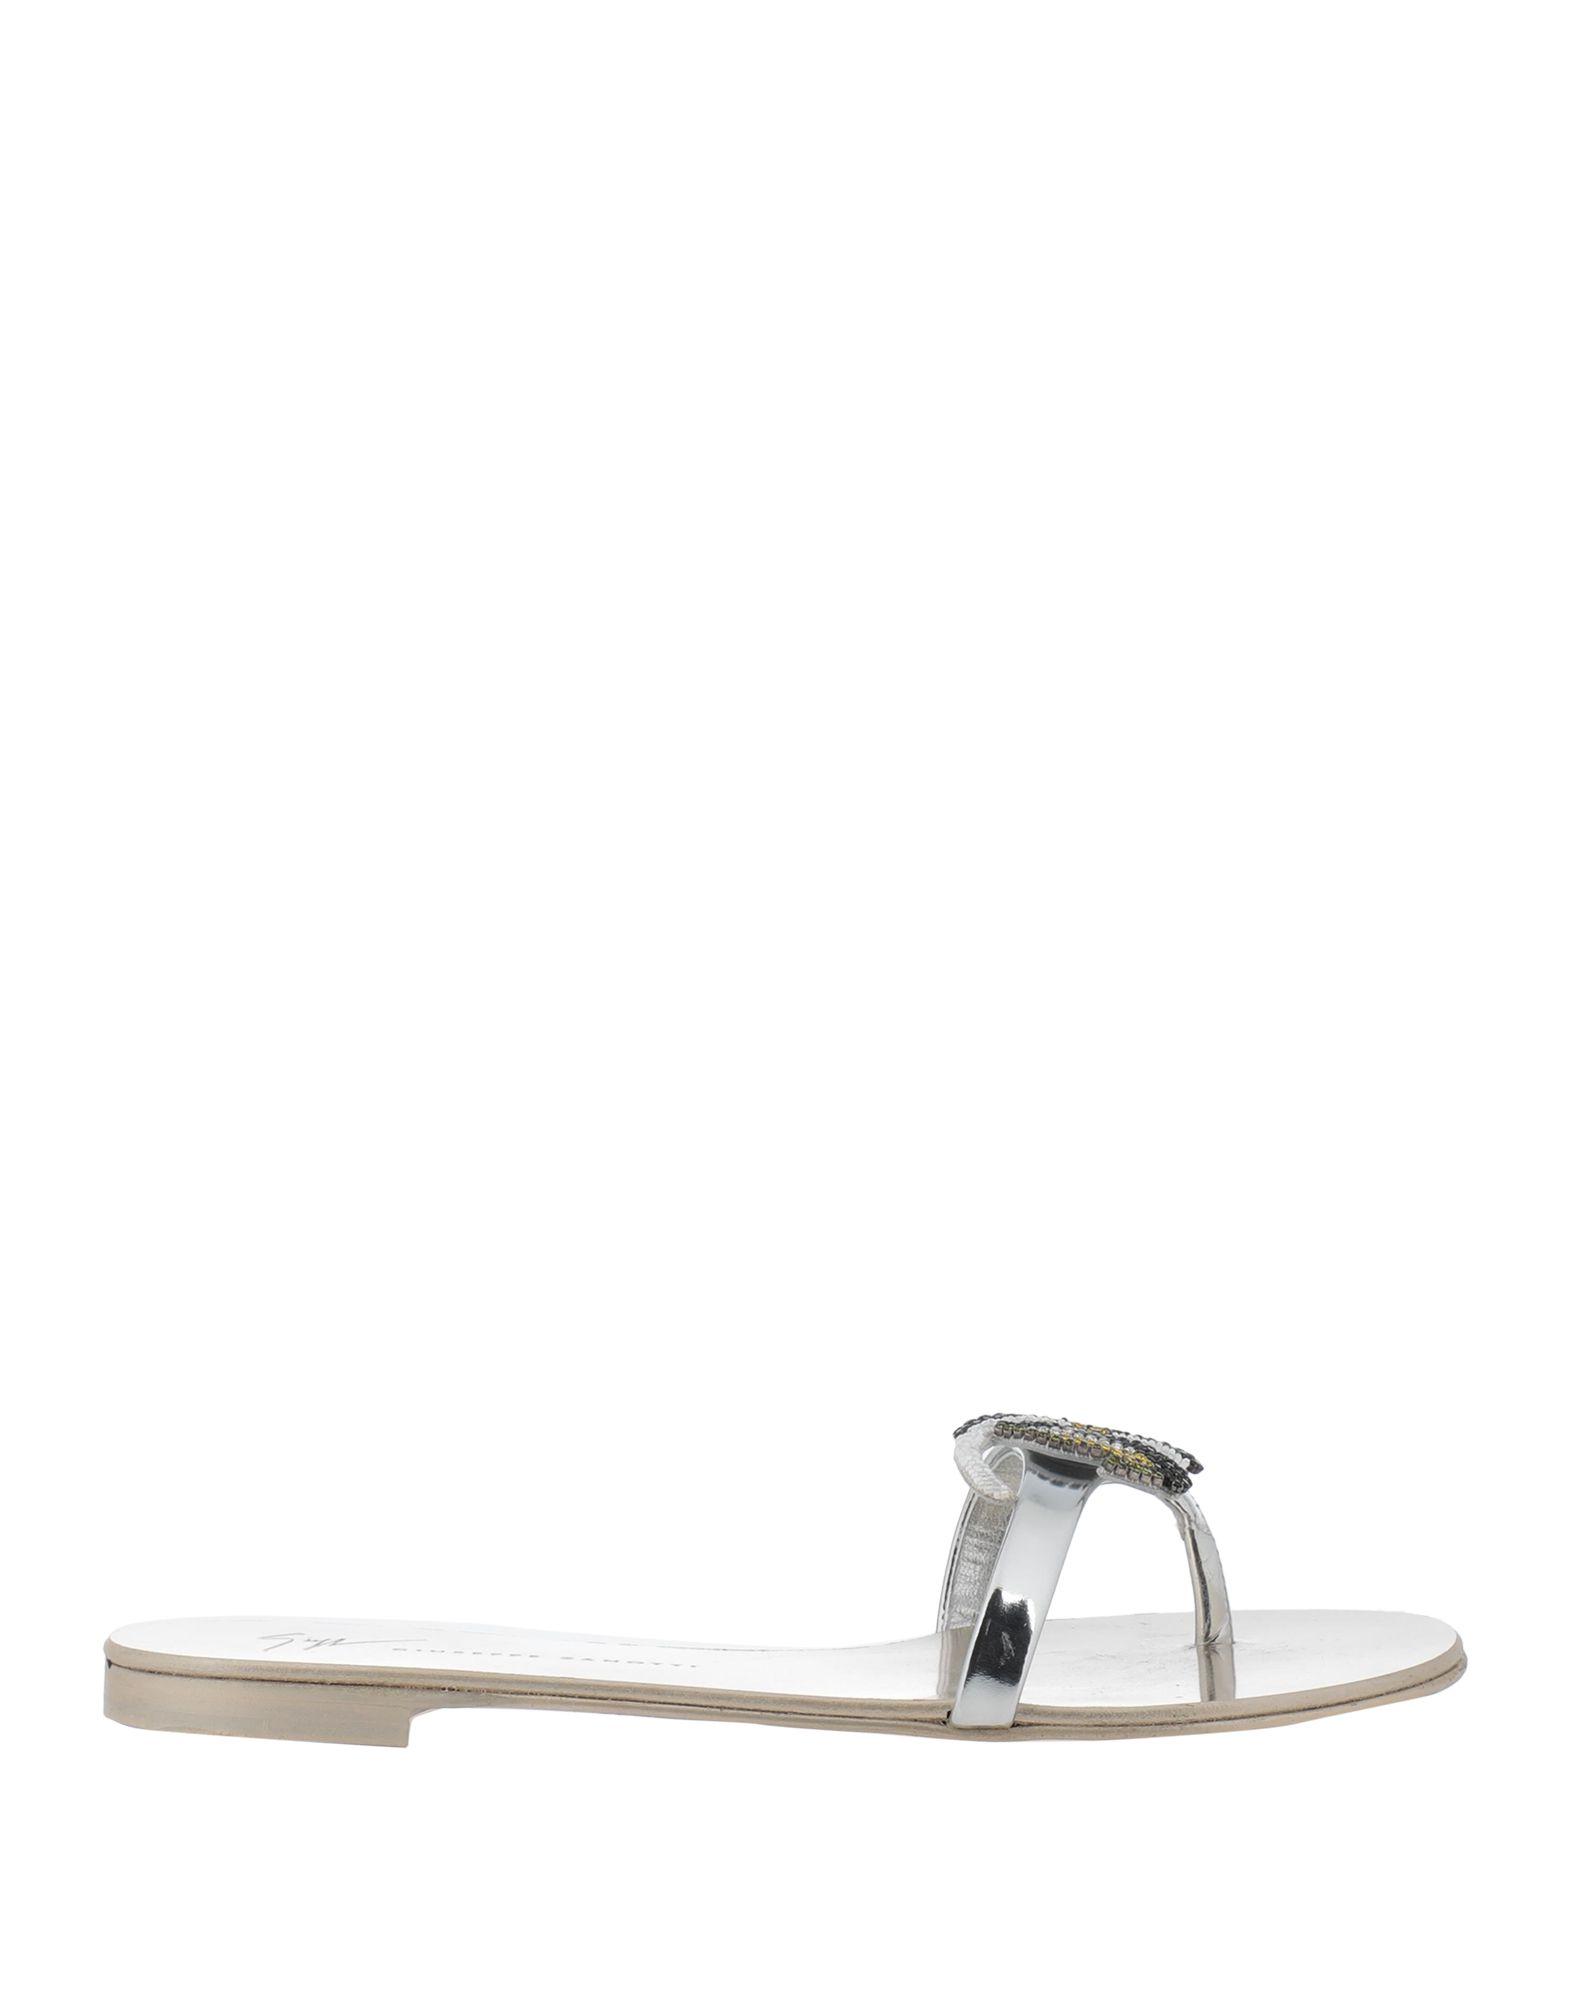 лыжные ботинки fischer xc sport